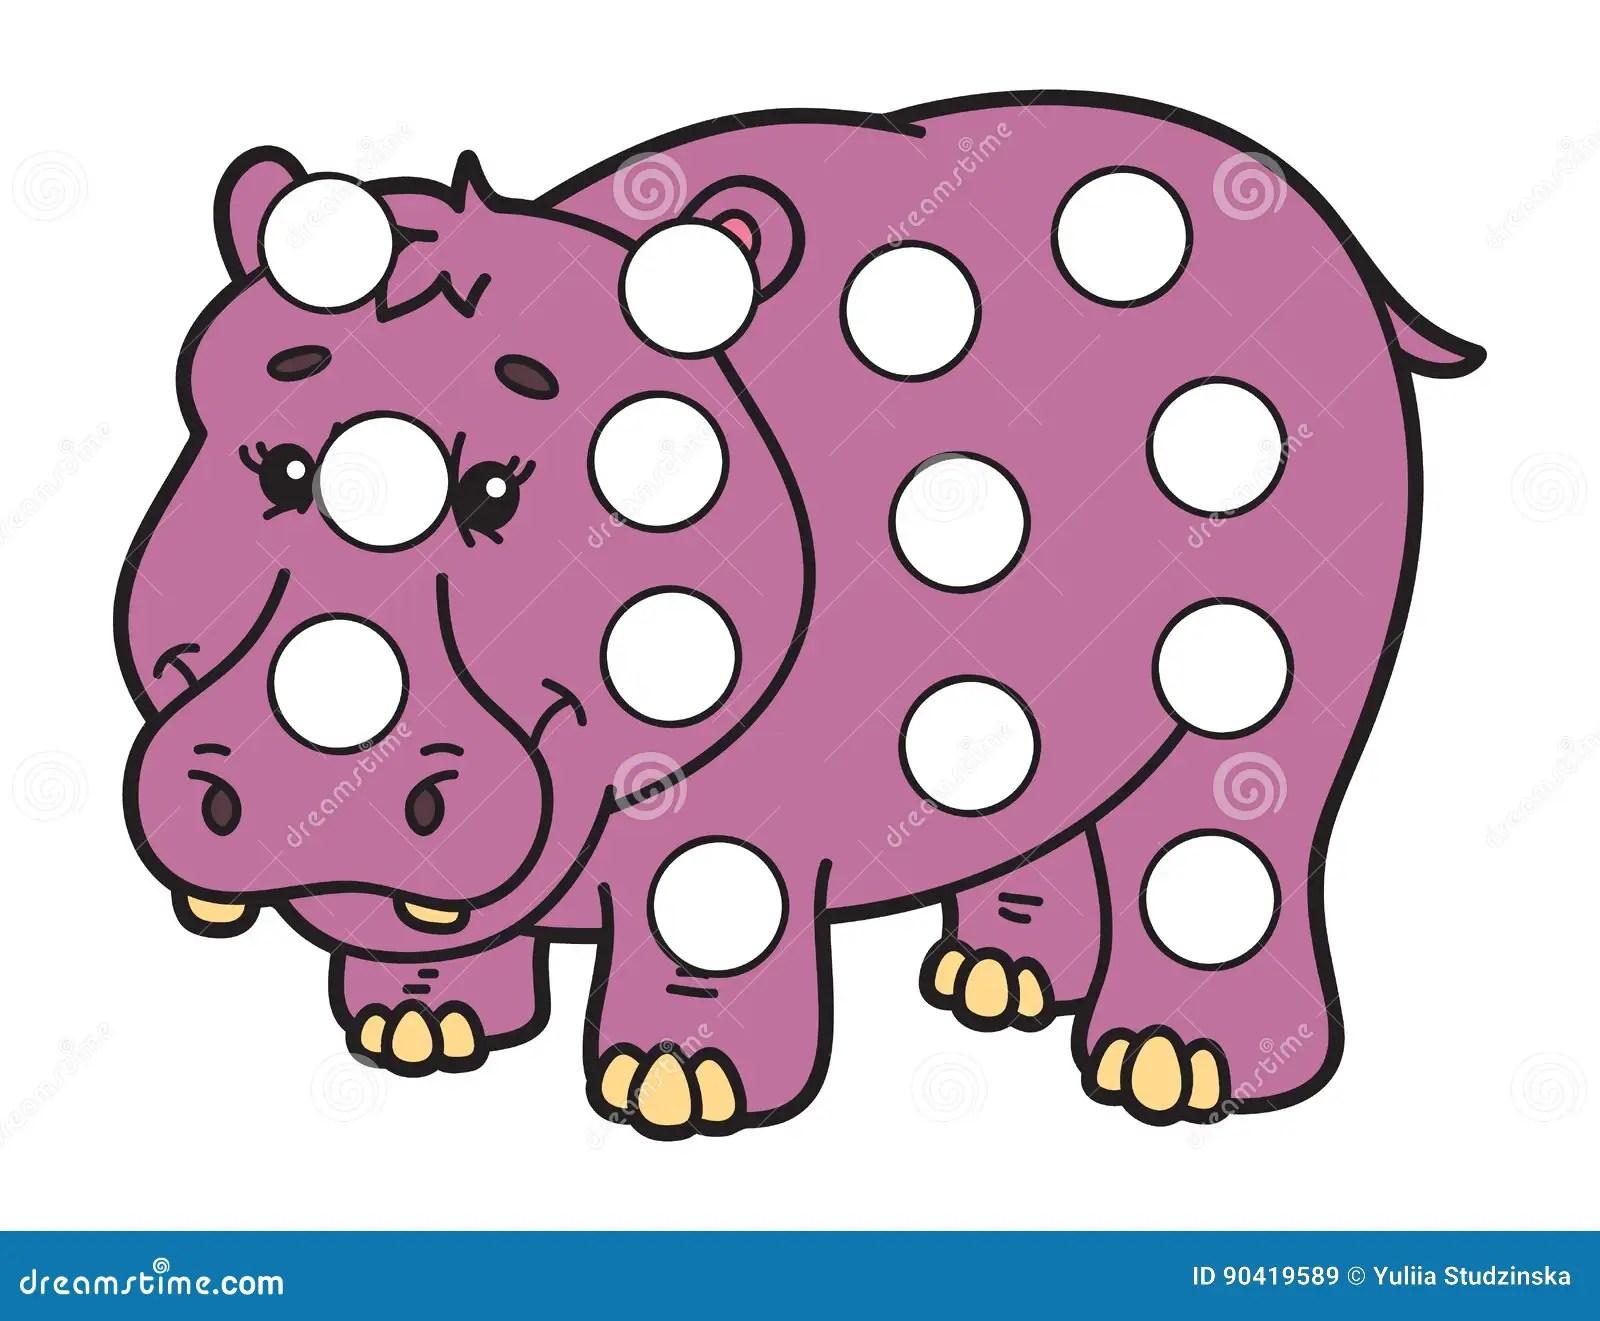 Educational Game Stock Vector Illustration Of Mammal